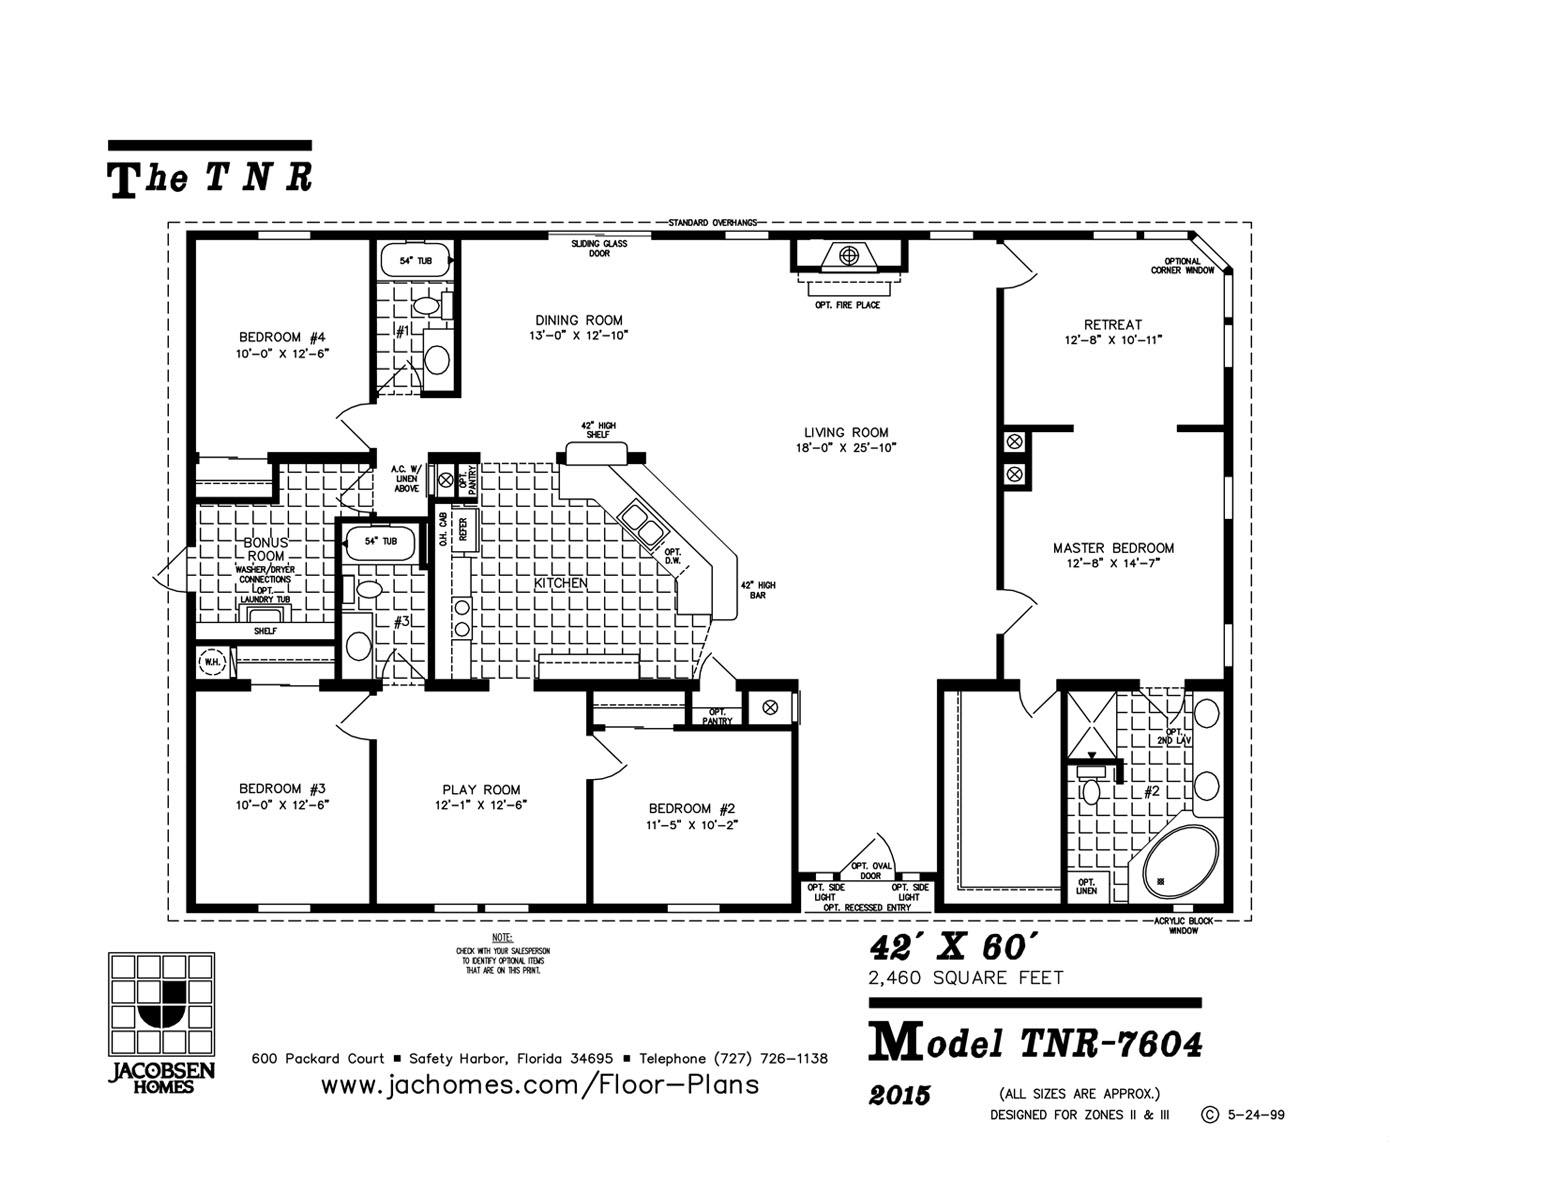 Tnr 7604 2 460 Sq Ft 4 Bedroom 3 Bath 42 X 60 Floor Plan